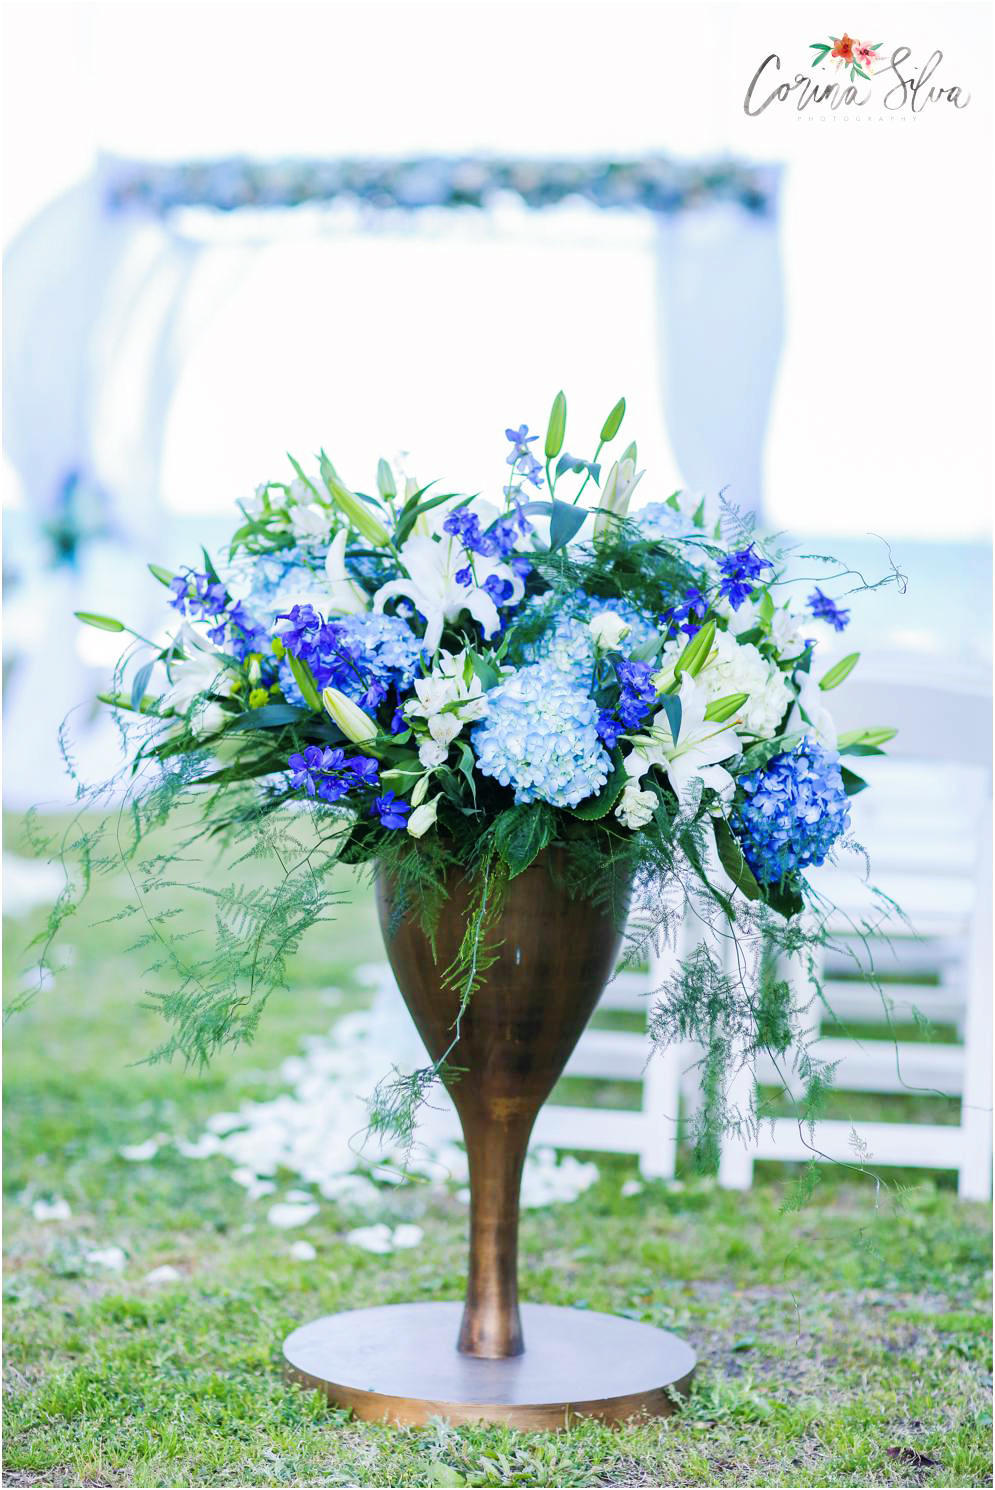 White-blue-hidrangeas-orchids-wedding-decorations, Corina-Silva-Decor-Photography-33.jpg